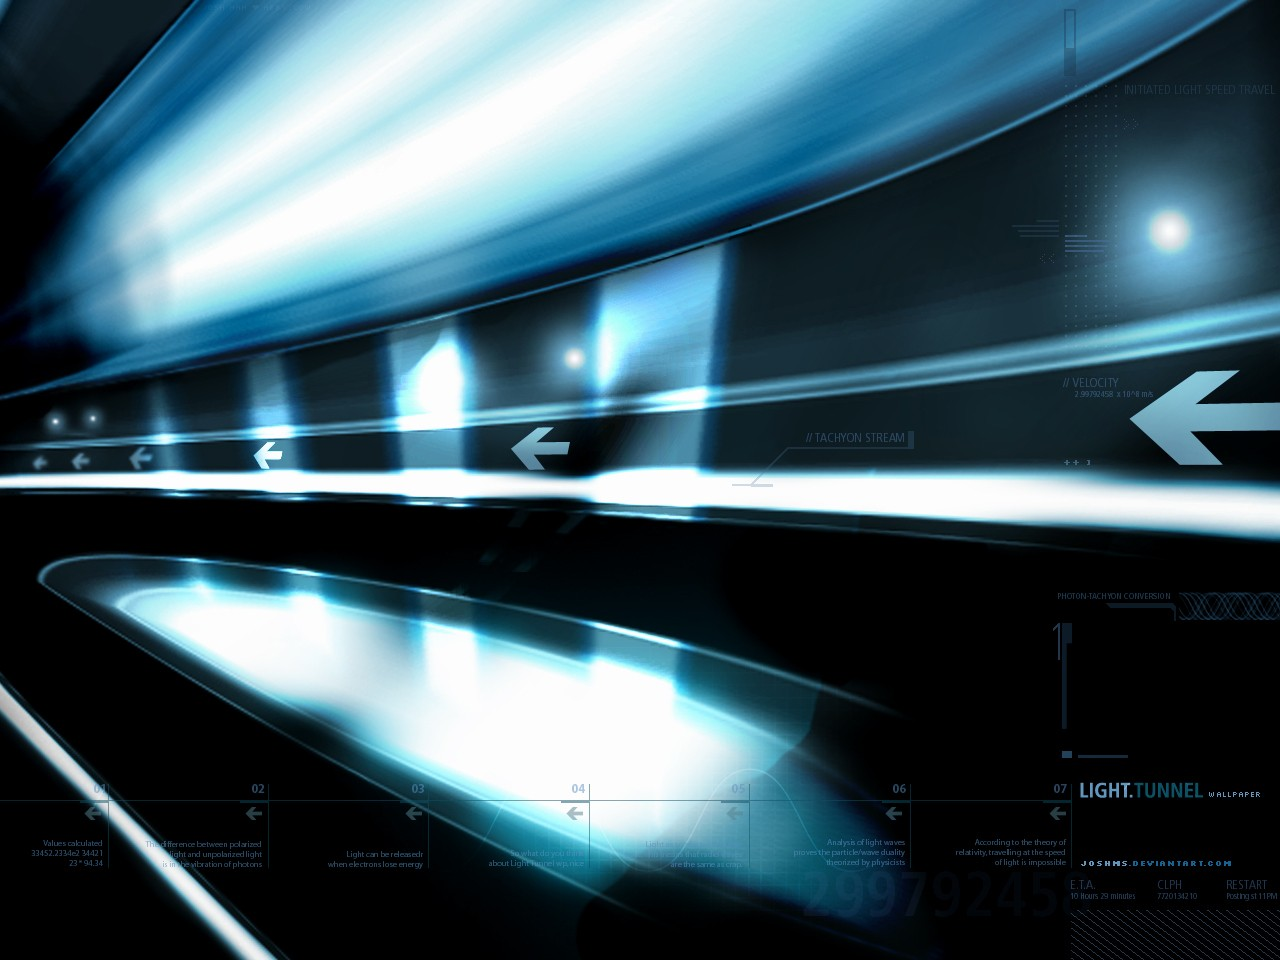 Wallpapers Digital Art Abstract Light Tunnel